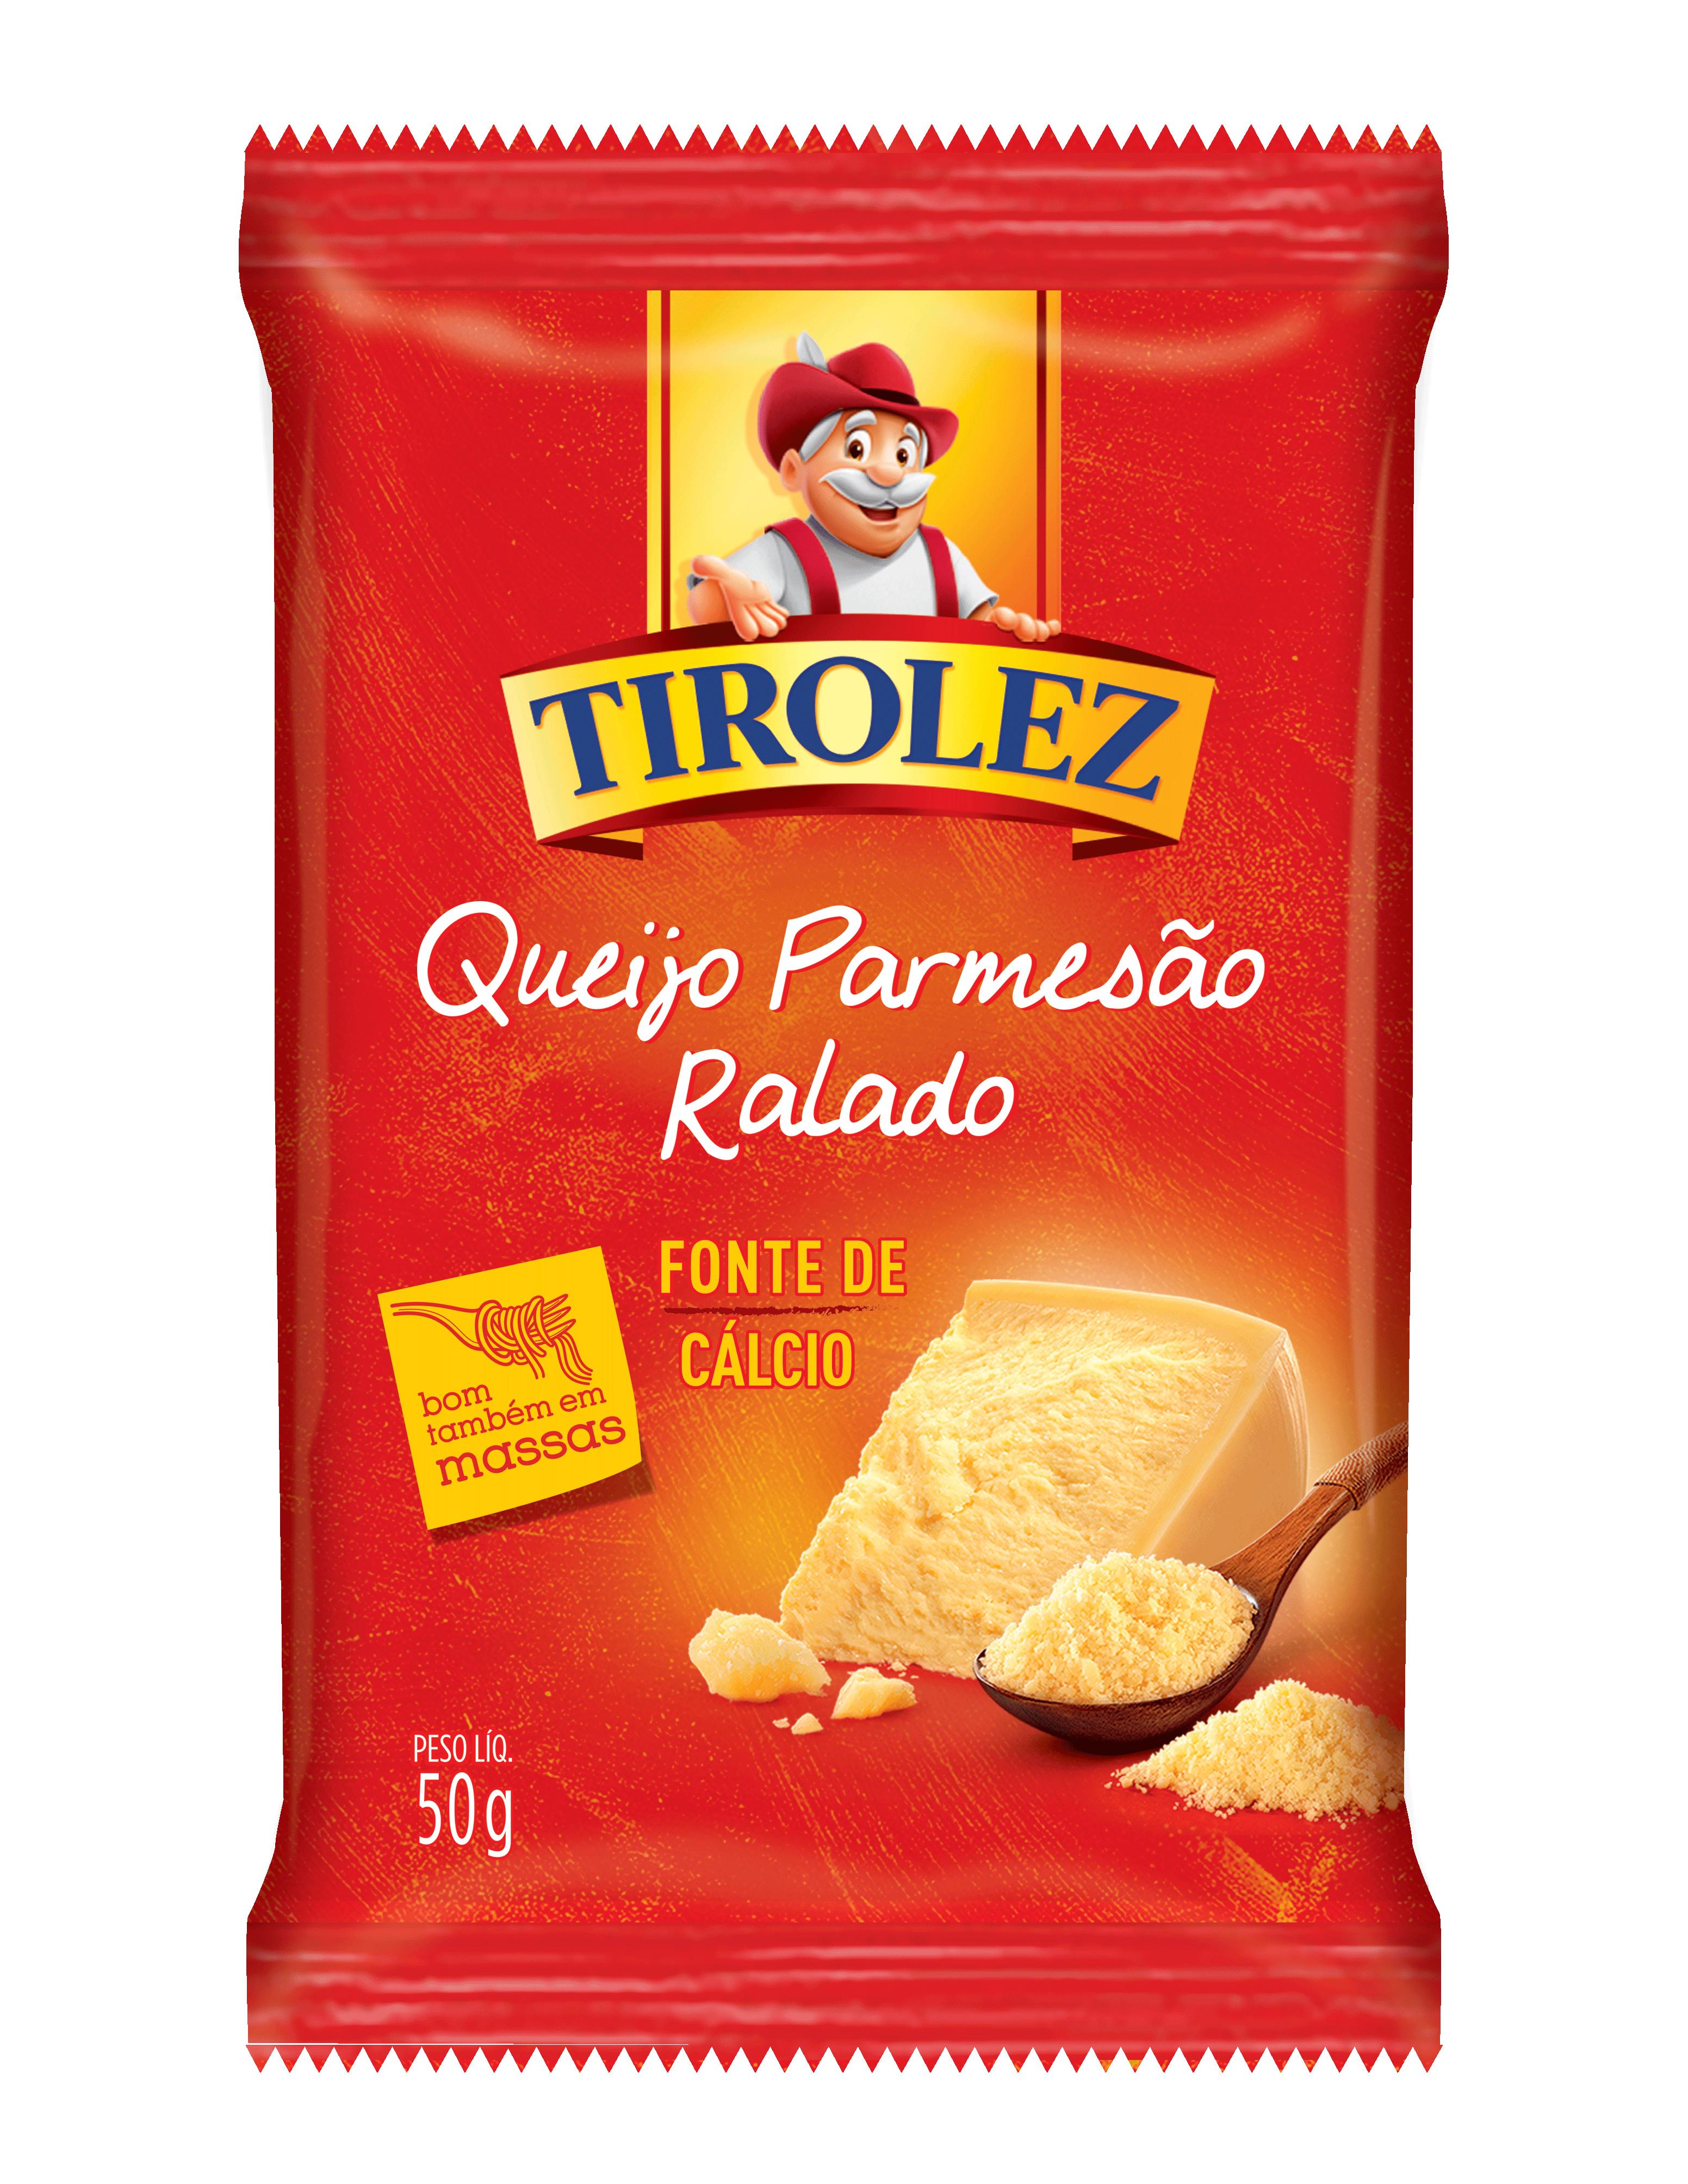 QUEIJO PARMESAO RALADO Tirolez 50g